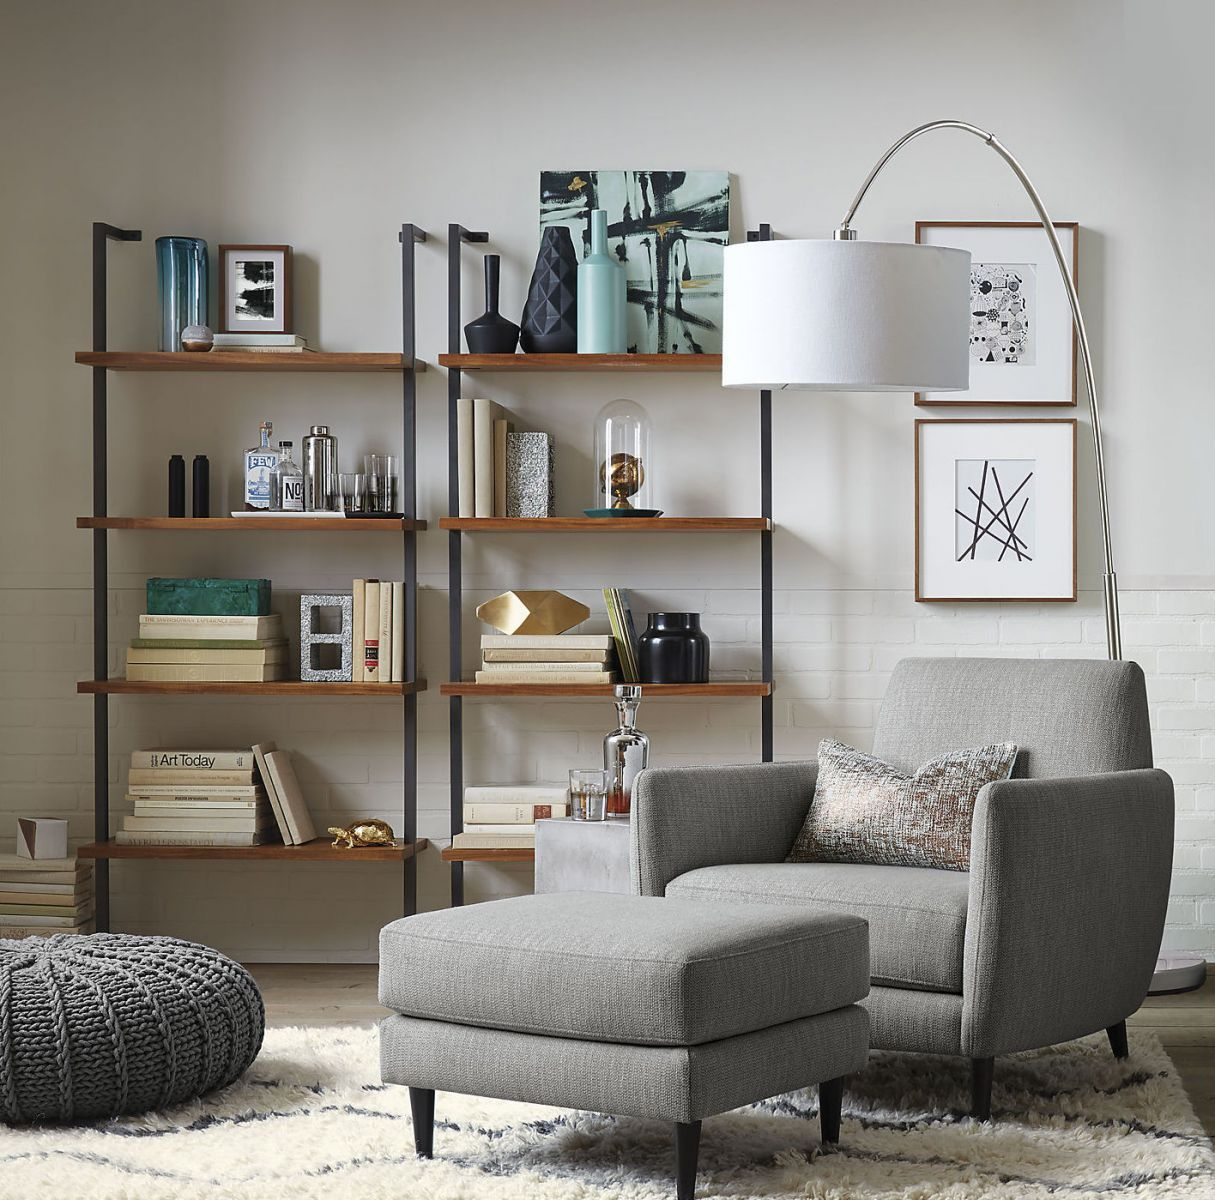 35 Furniture Finds Under $200 | Arc floor lamps, Bookcase ...